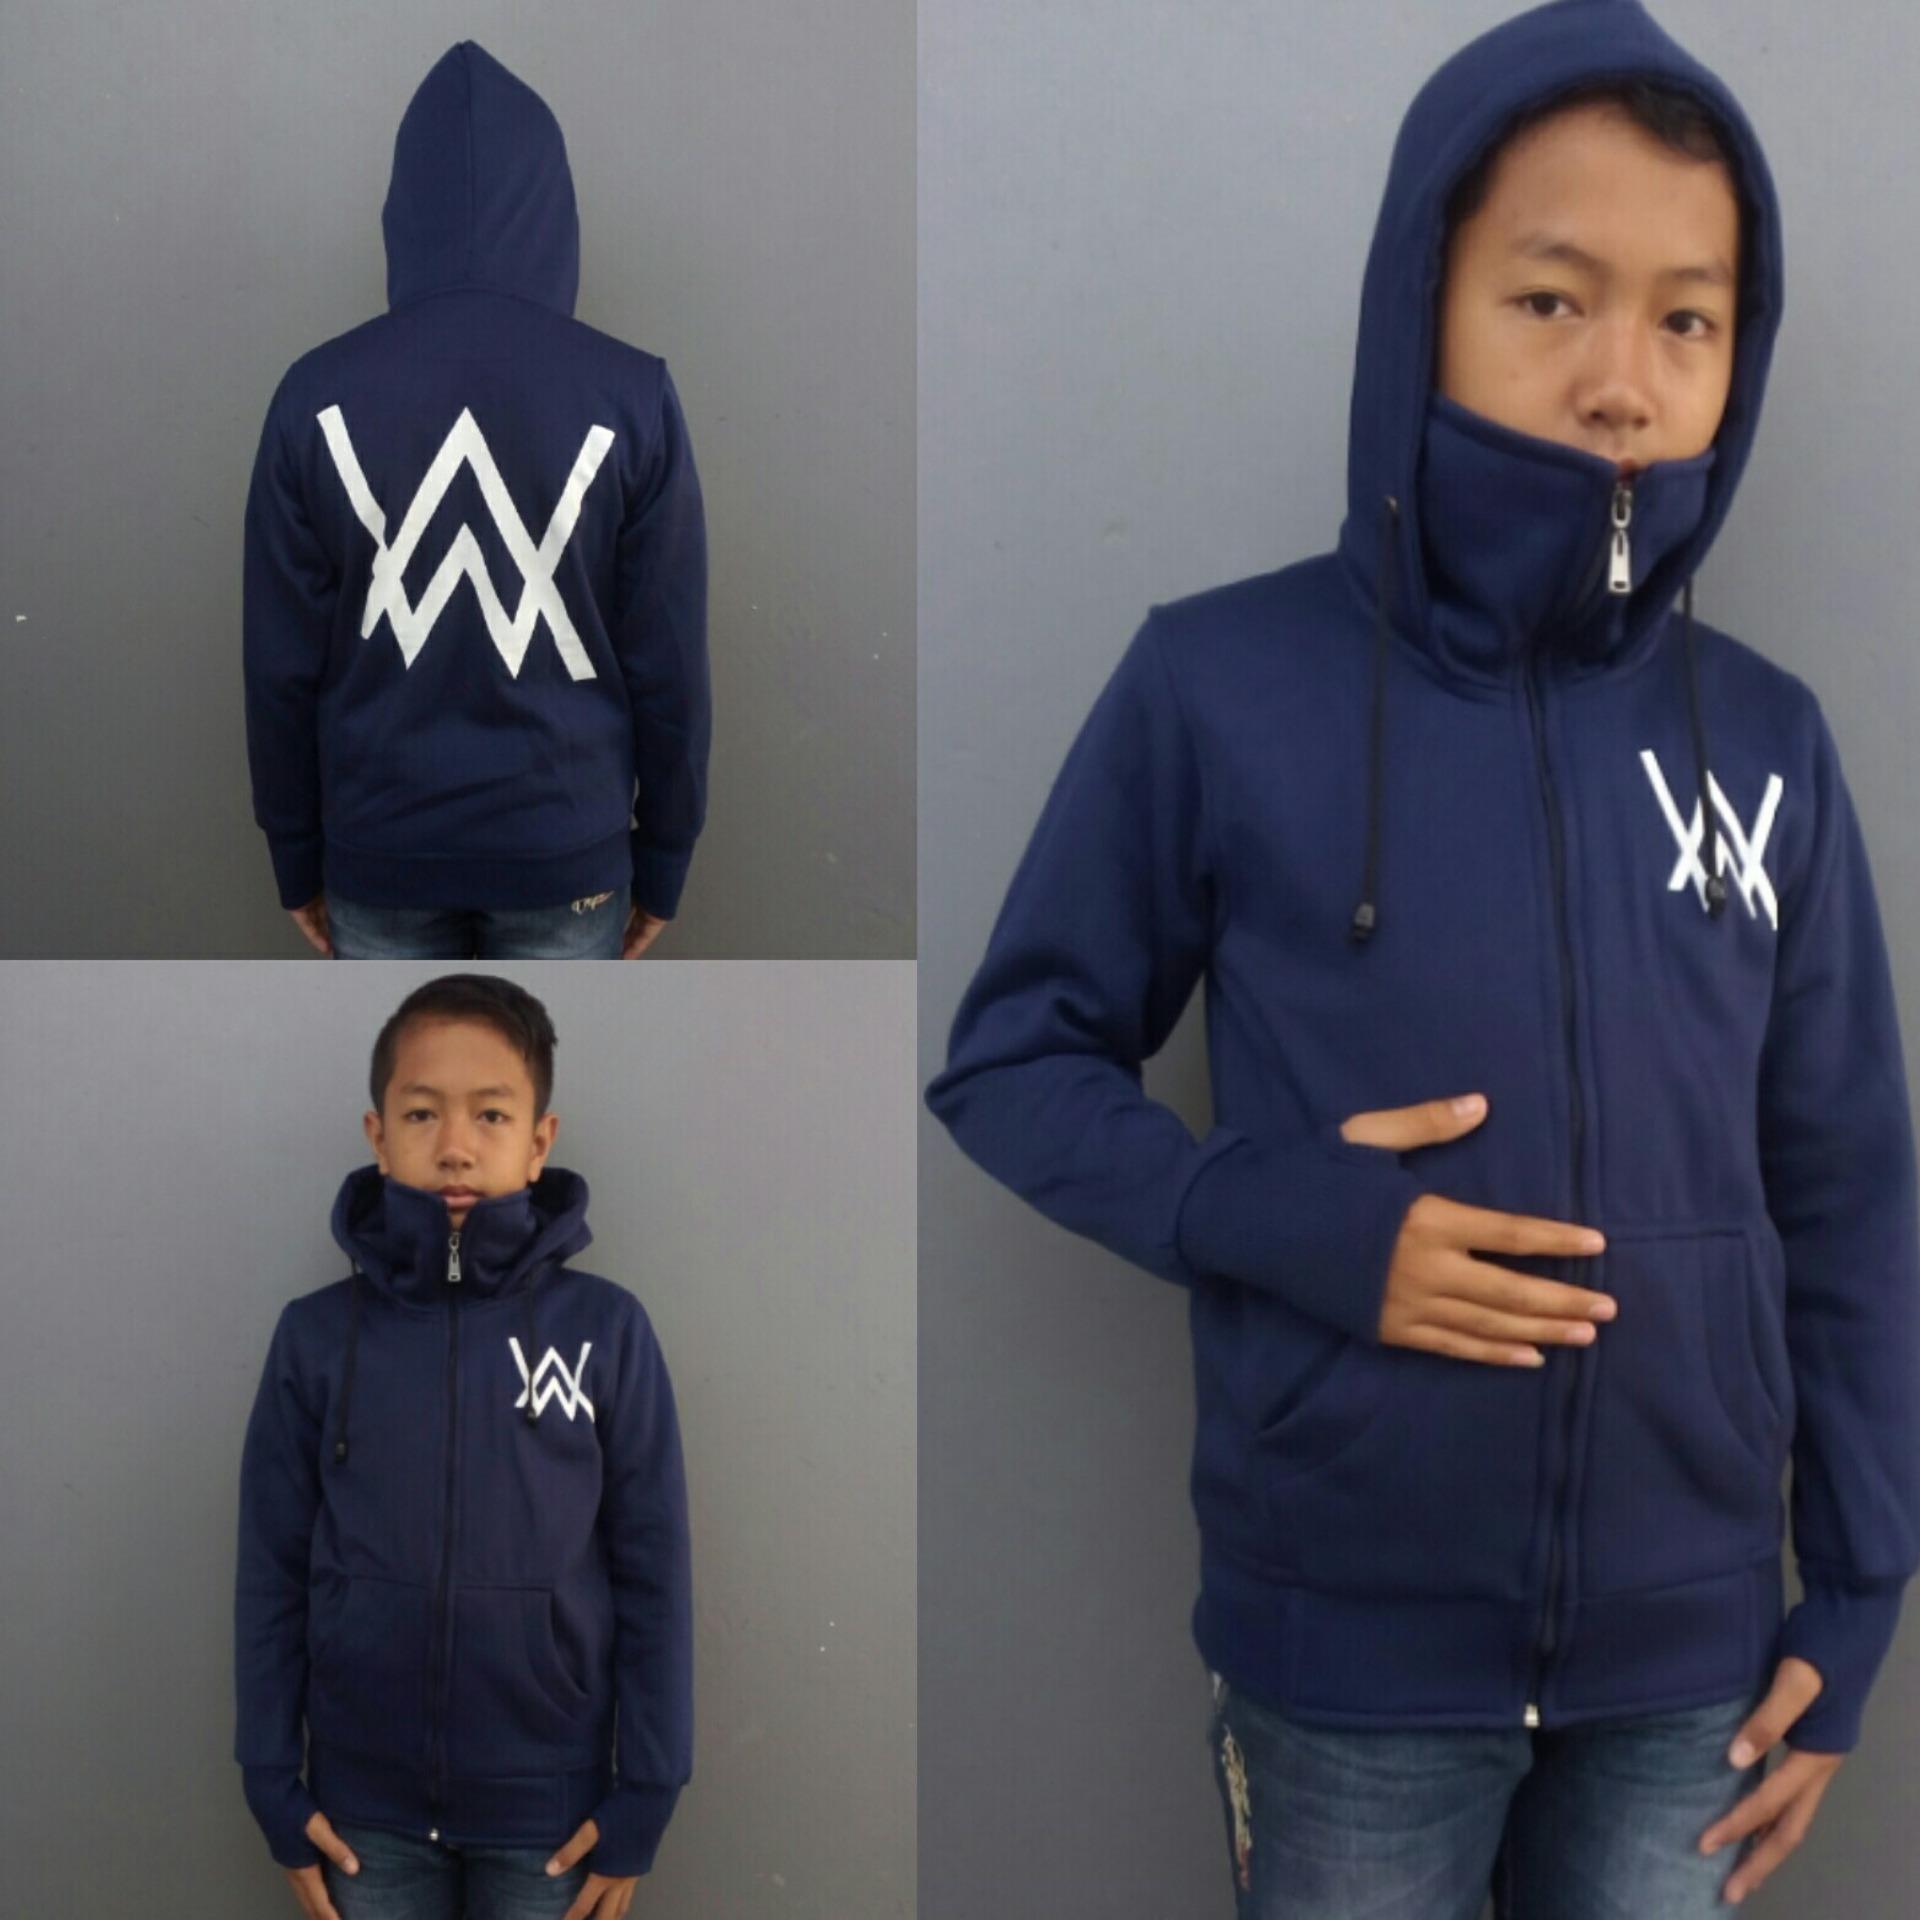 Jaket Sweater Hoodie Roundhand Ninja Zipper Alan Walker anak AW ( Hitam & Navy )